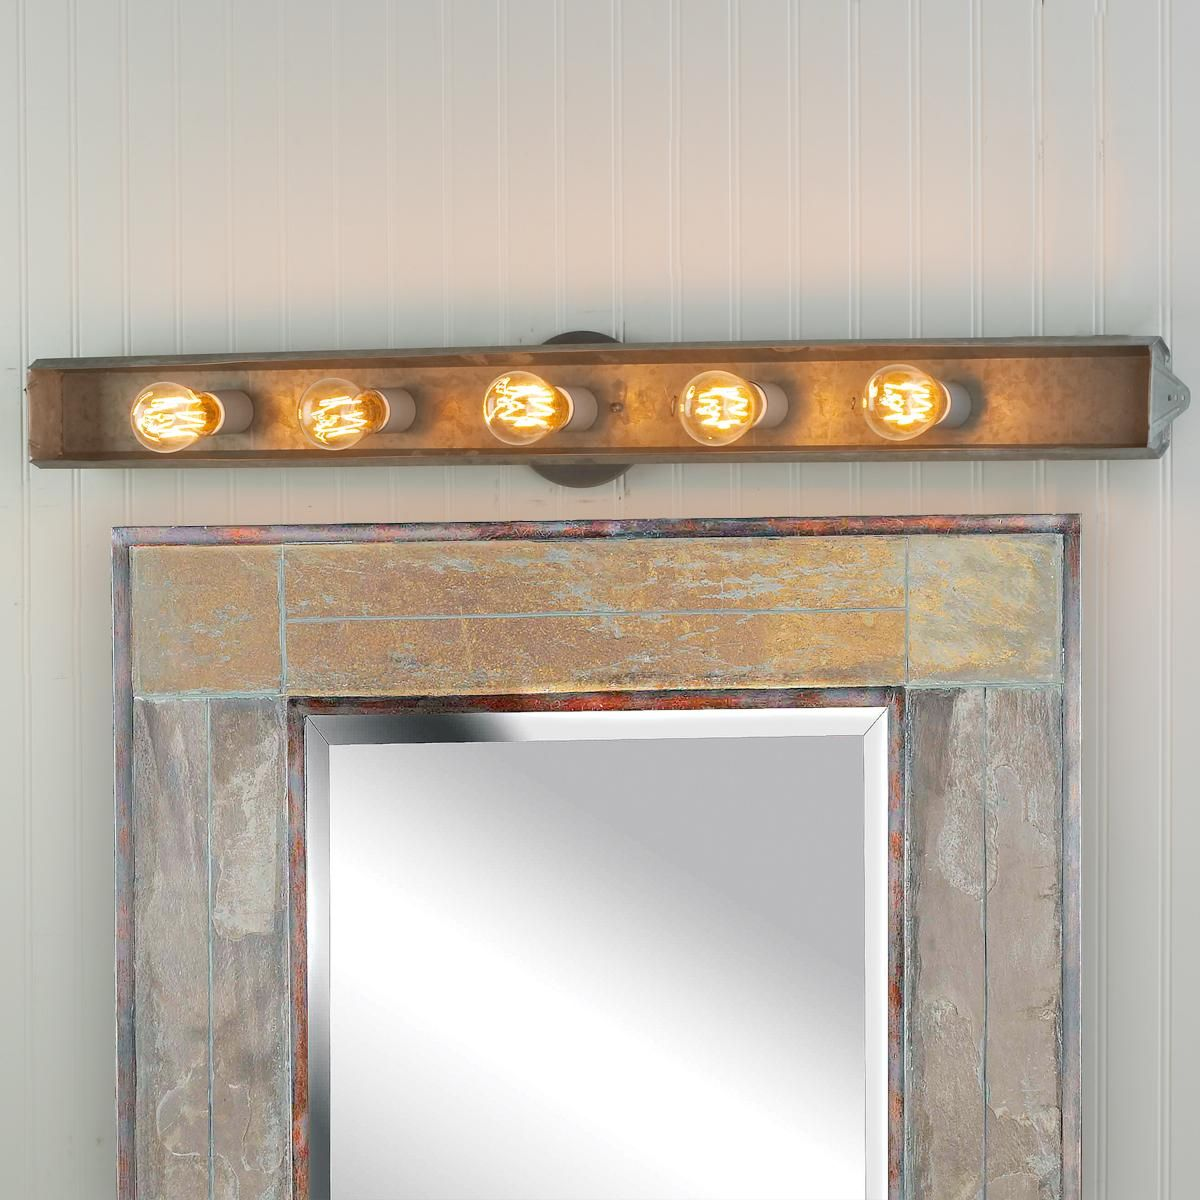 Galvanized Rustic Vanity Light For The Bathroom Rustic Vanity